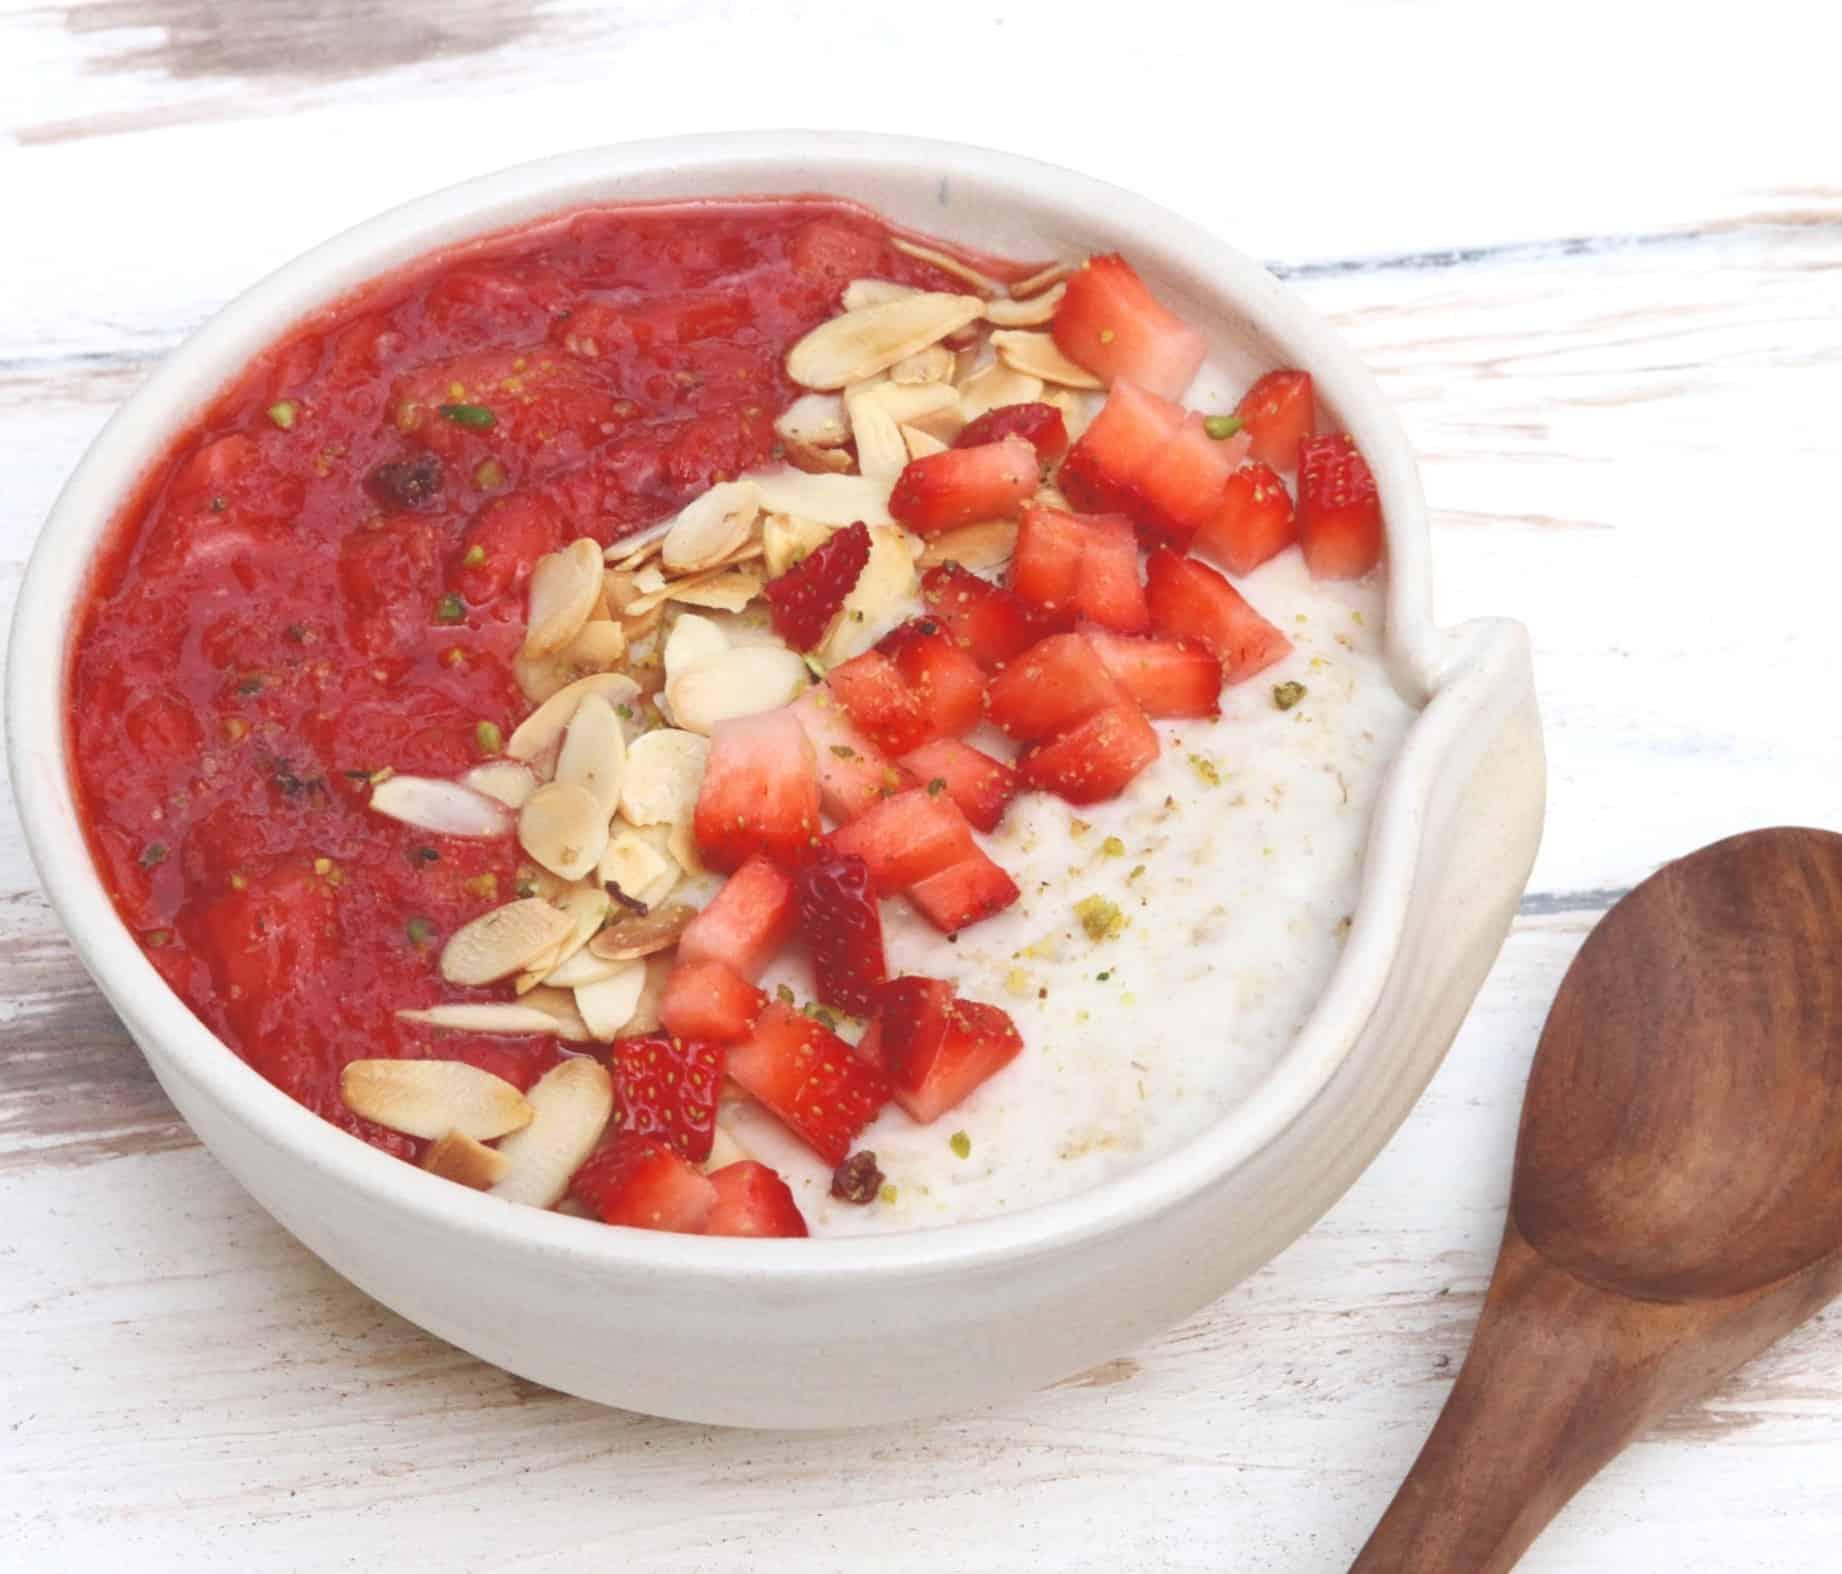 Cashew Strawberry Oatmeal